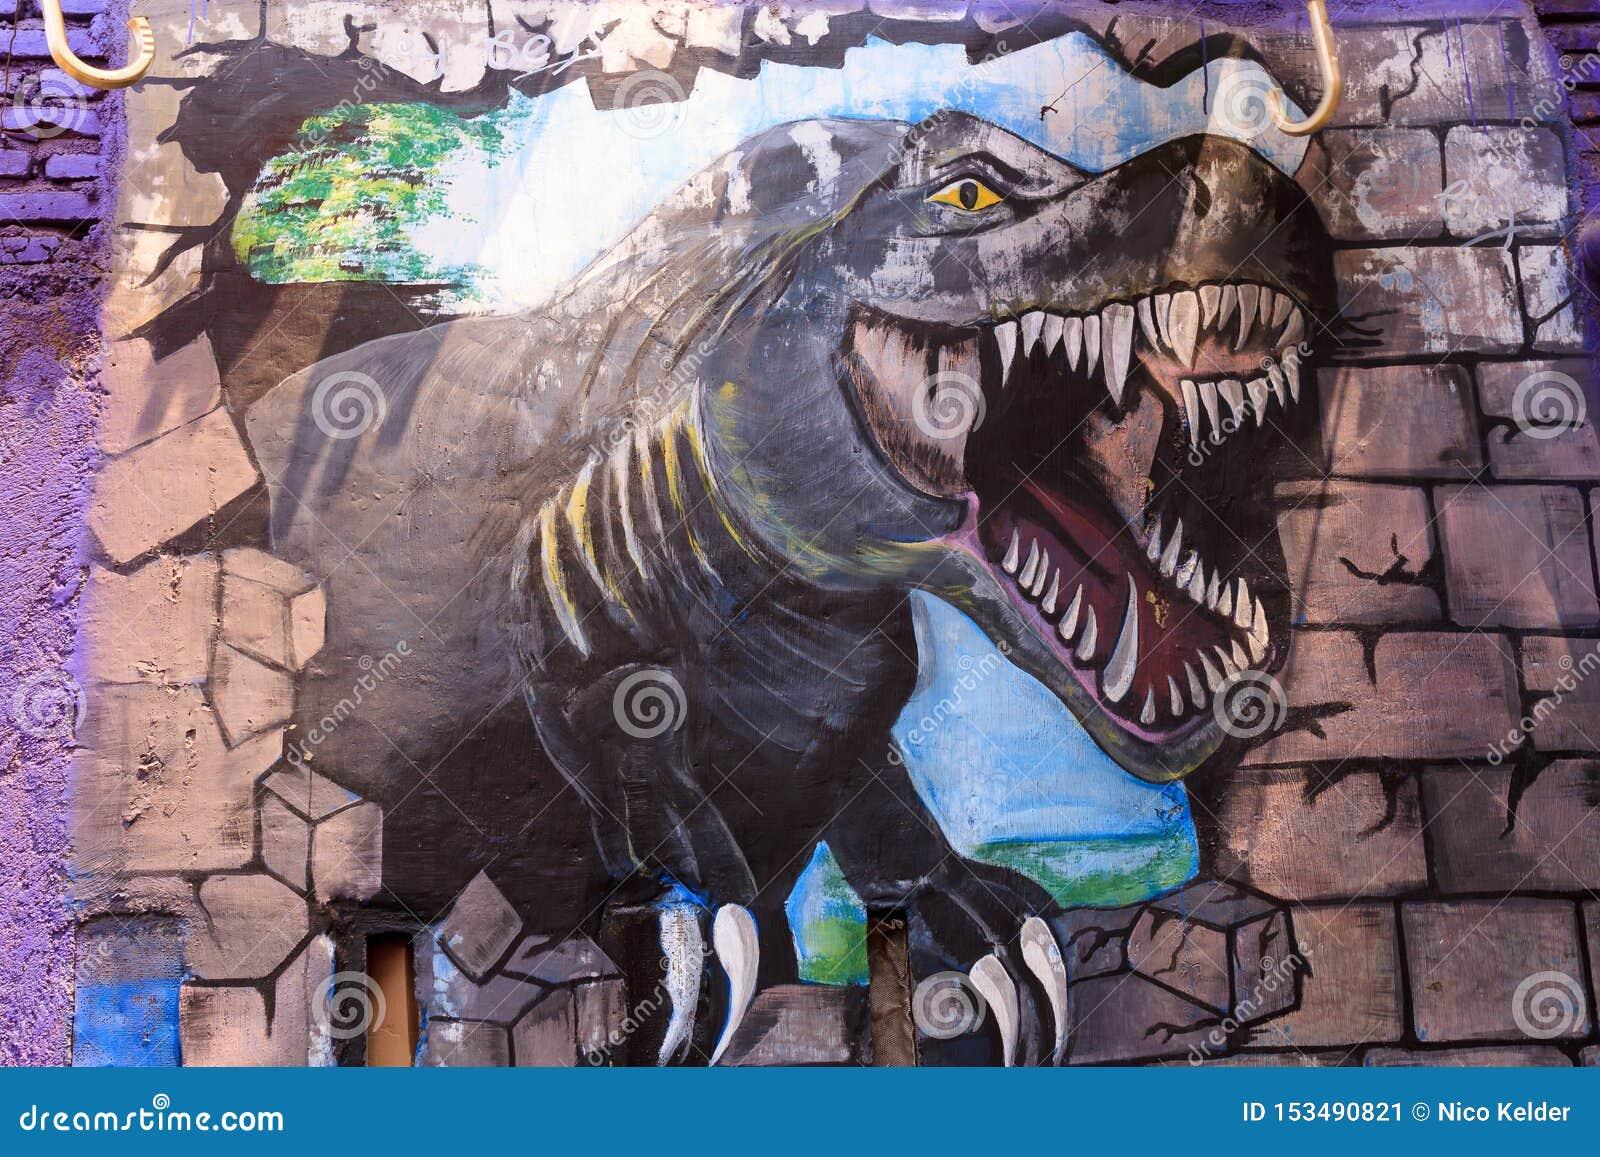 En septiembre de 2018 Street Art en Kampung Warna Warni Jodipan Malang, Indonesia